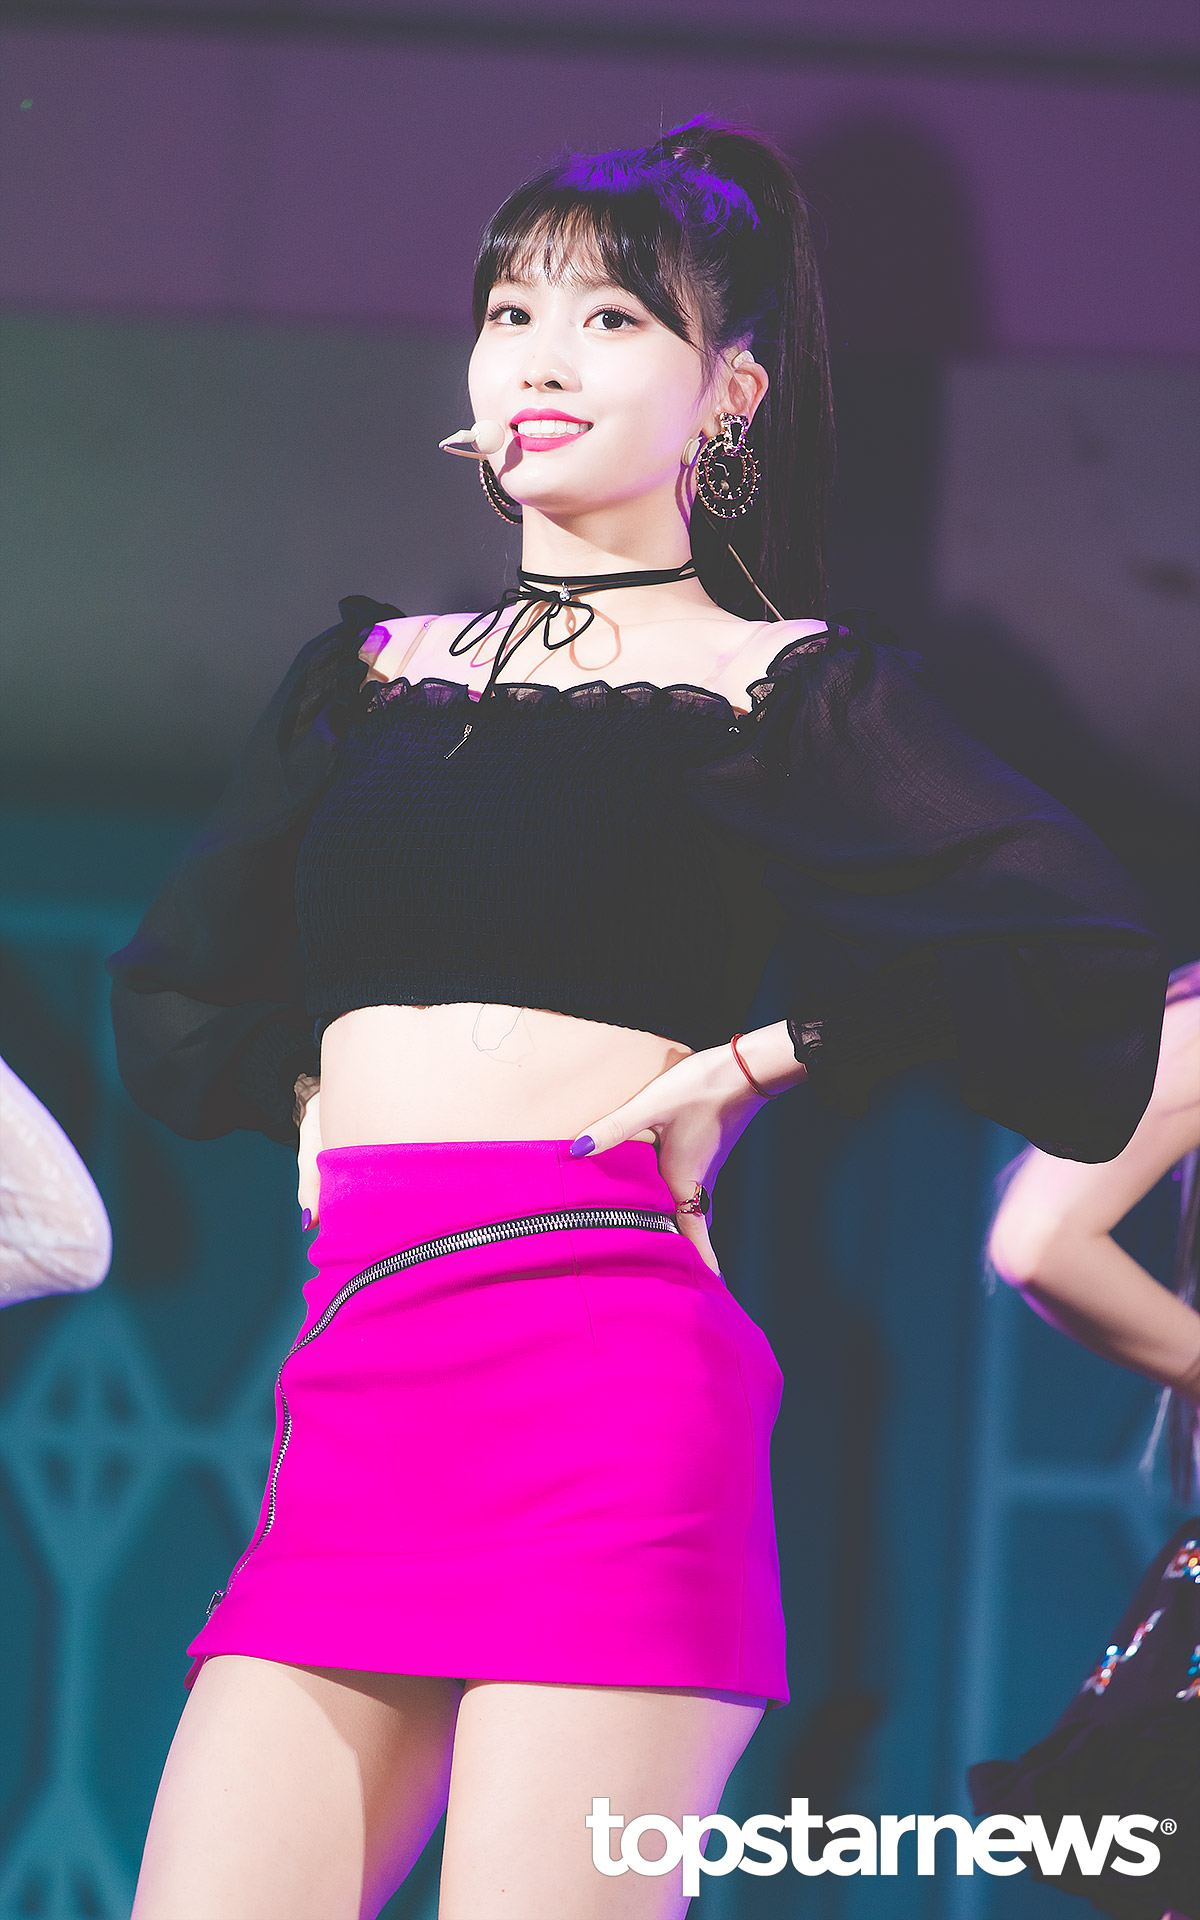 Momo最厲害的地方就是在於她的身材線條,尤其腹肌超驚人,自然舞台裝也會以這個當作是優點啦!利用短版露肩上衣搭配紫紅色的短裙,果然是最能夠展現她美麗身短的好搭配。